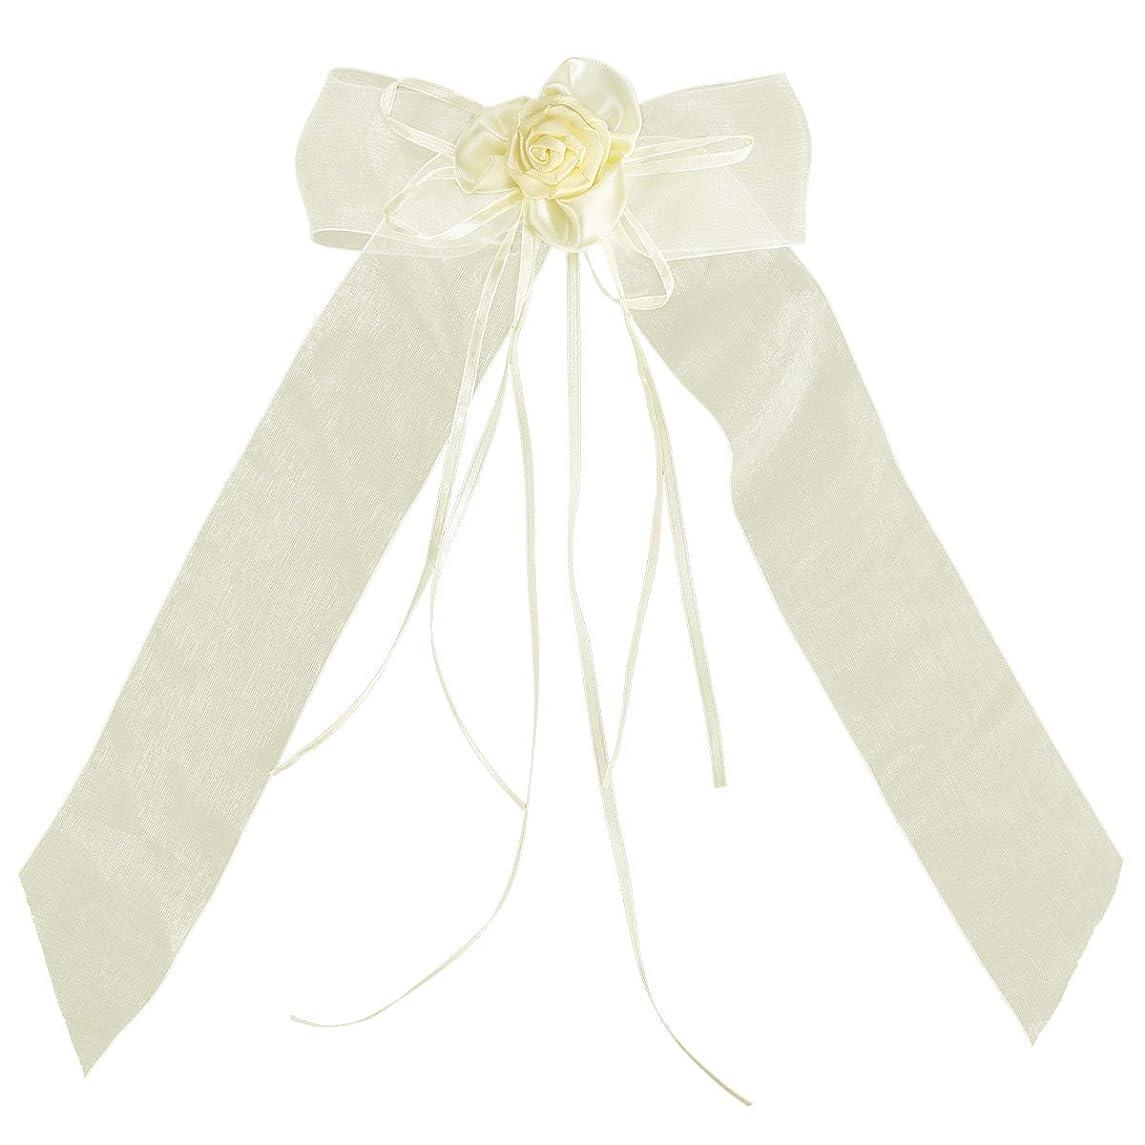 4x Organza Satin Ribbon Bows Bowknot Rosette Wedding Cars Gift Wrap Decoration (13x30cm, beige)